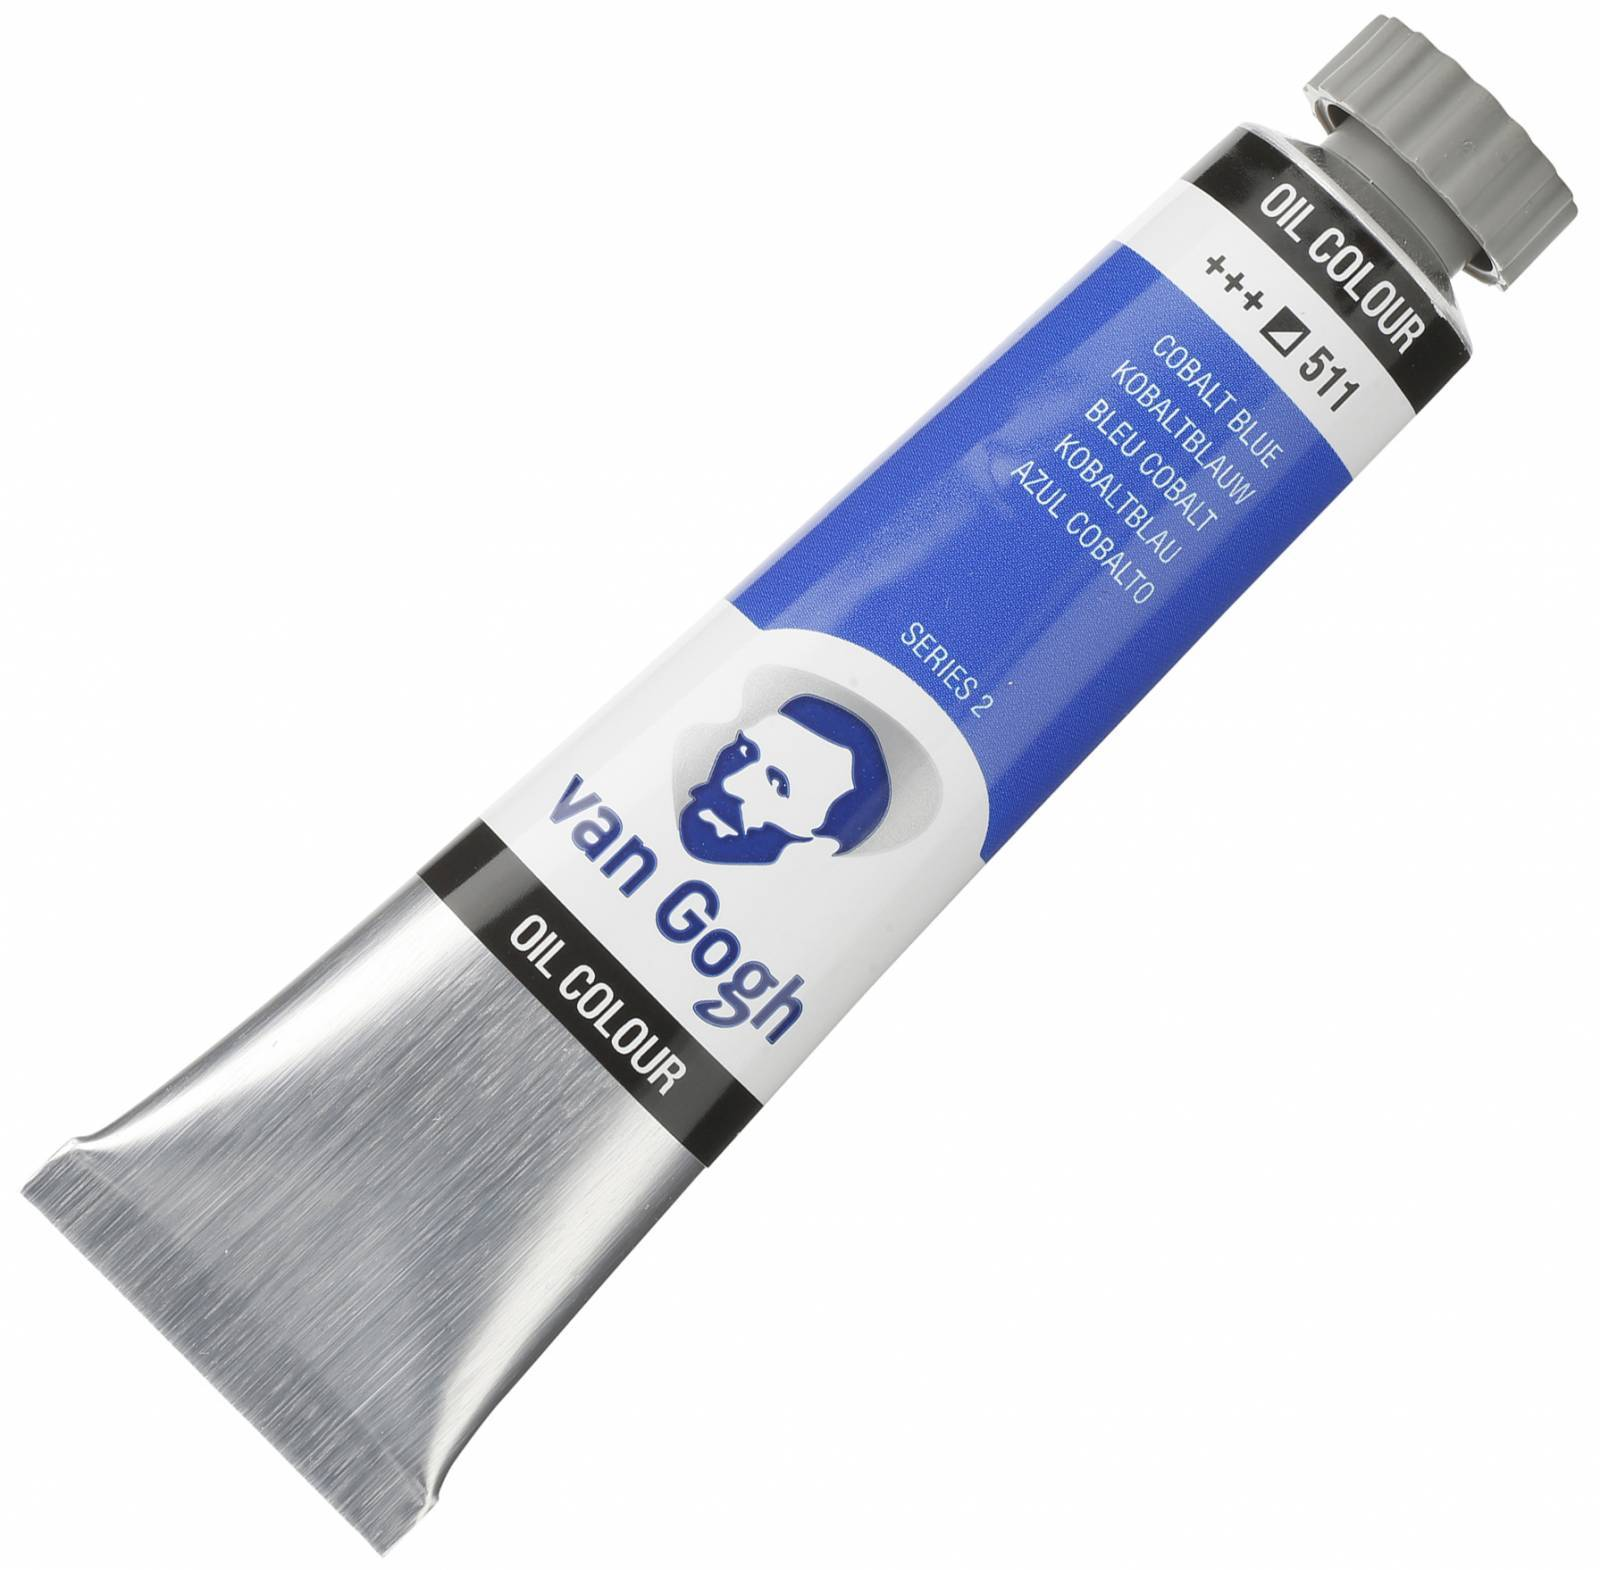 Oleo Van Gogh Cobalt Blue +++511 - serie 2 - Tubo 20ml - Papelaria Botafogo